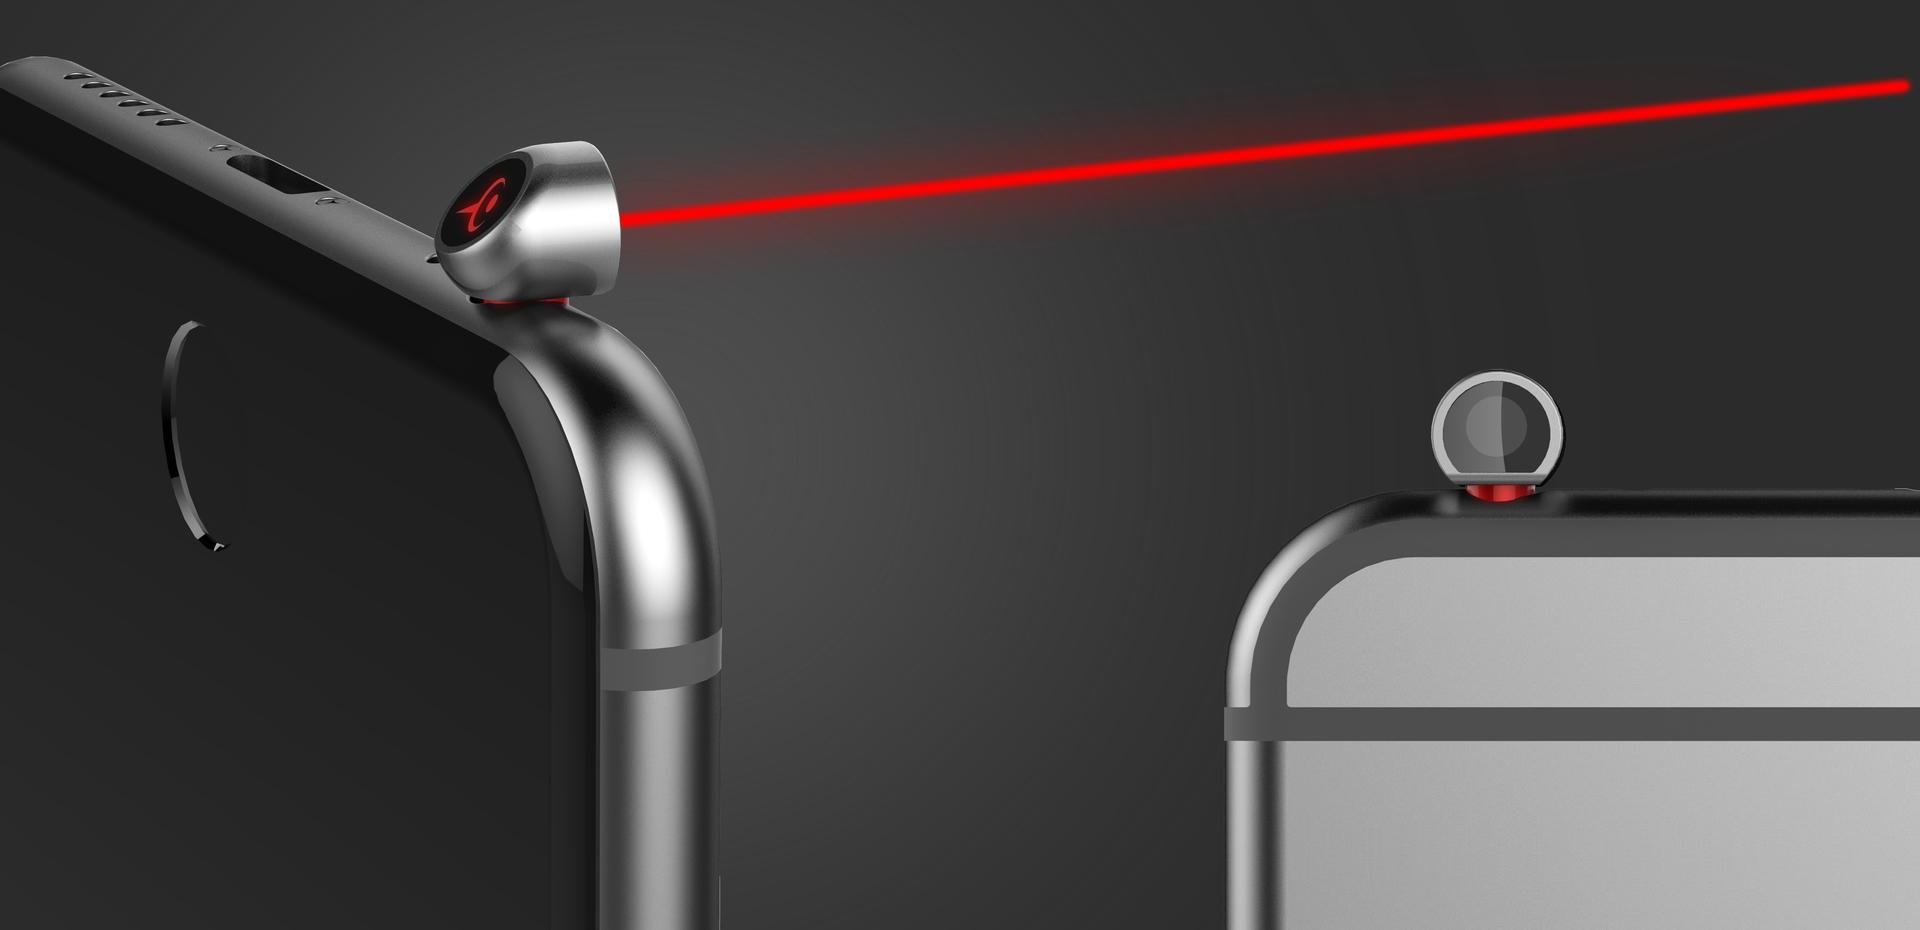 ipin Spatial Ruler For iPhone (1)